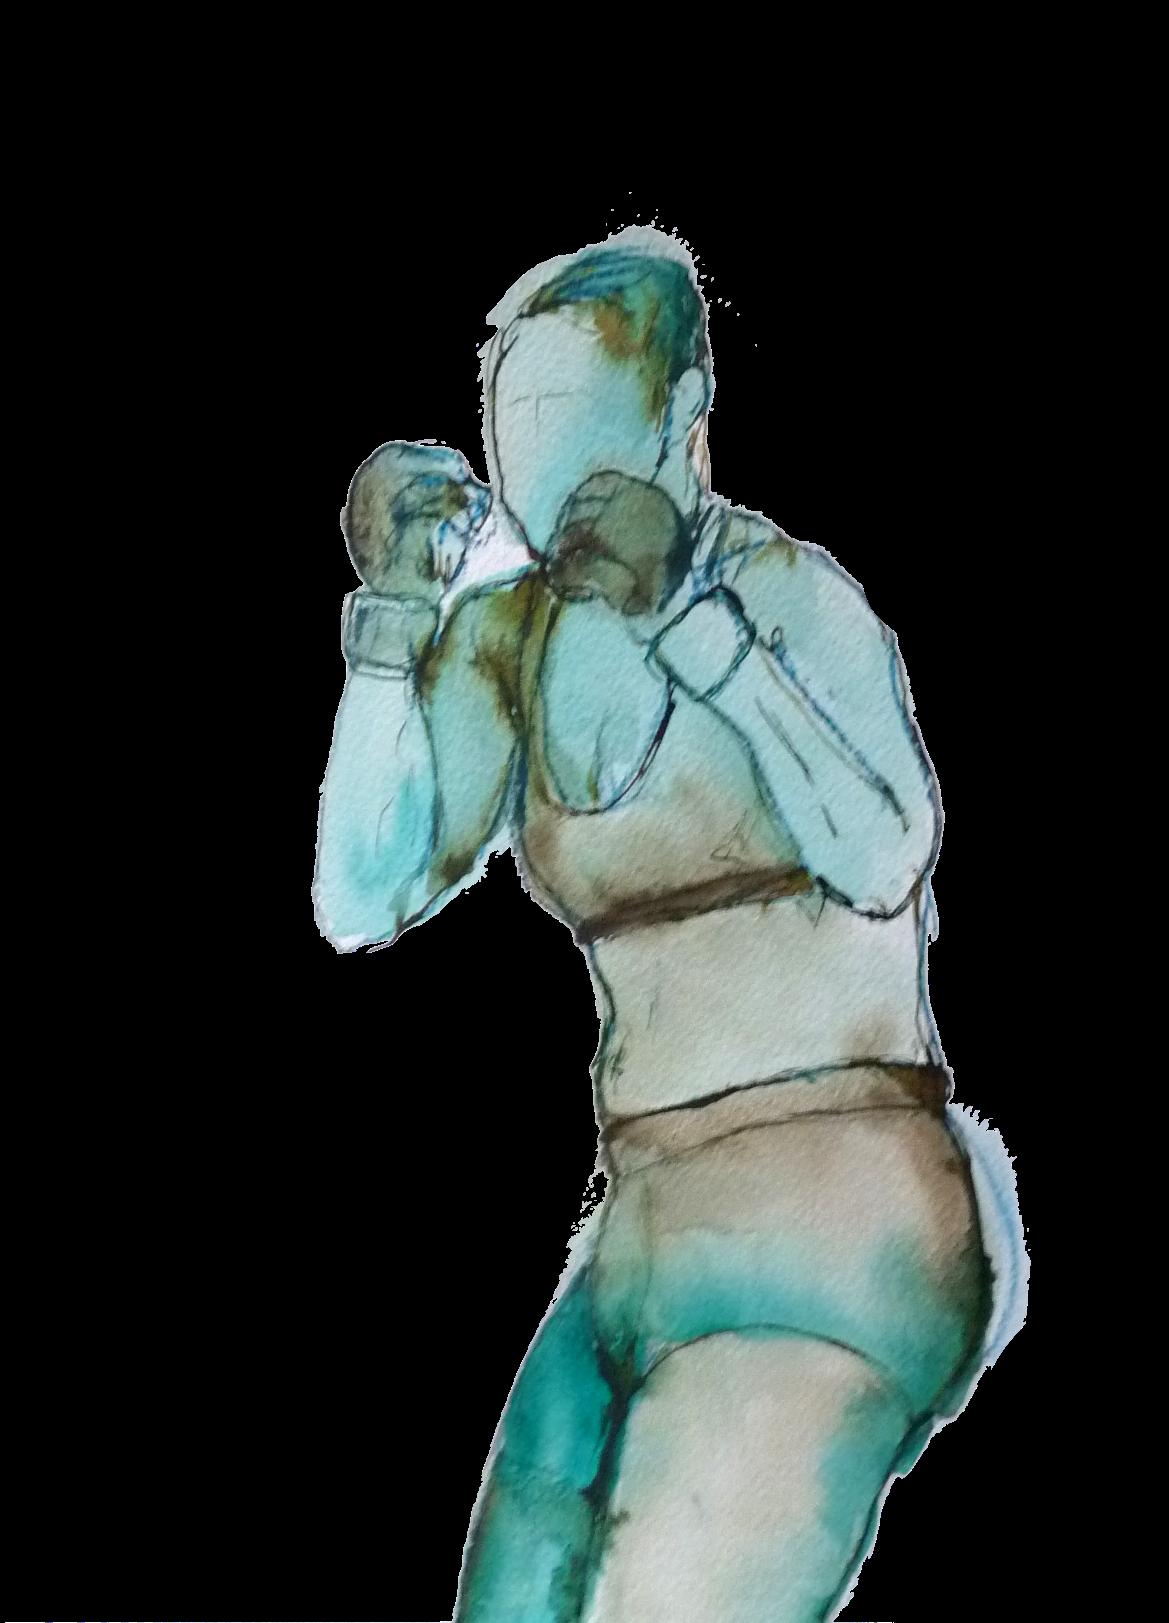 combat mma boxe dessin Elize pigmentropie sport féminin